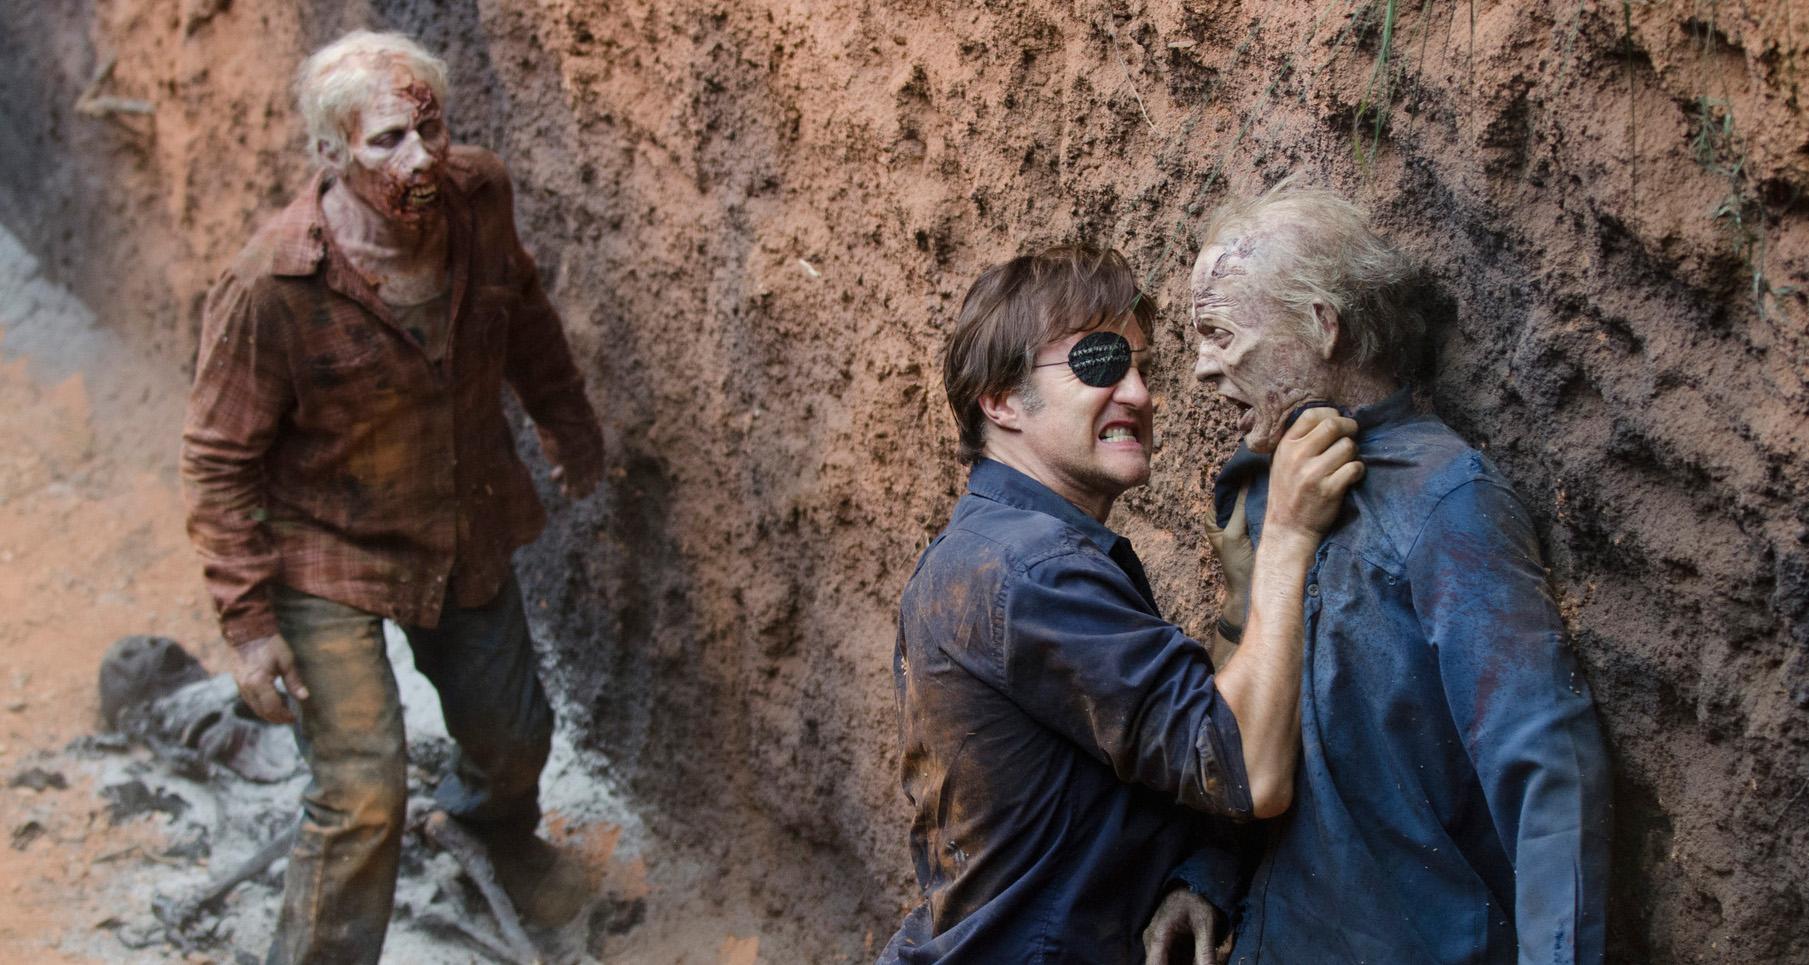 The-Walking-Dead-4-Temporada-S04E06-Live-Bait